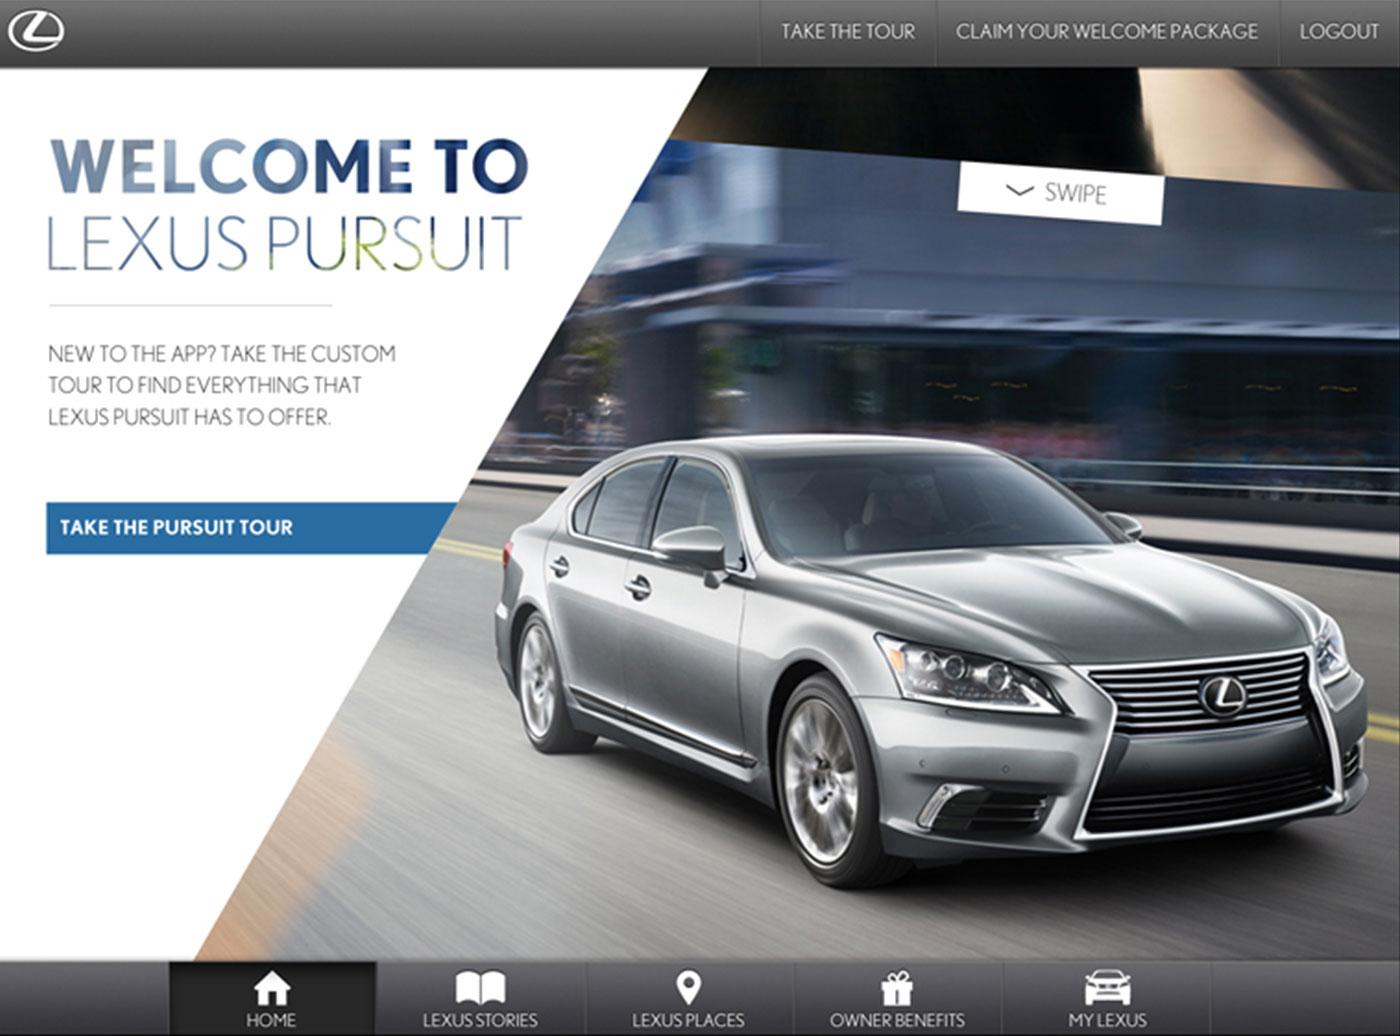 My Lexus & Beyond